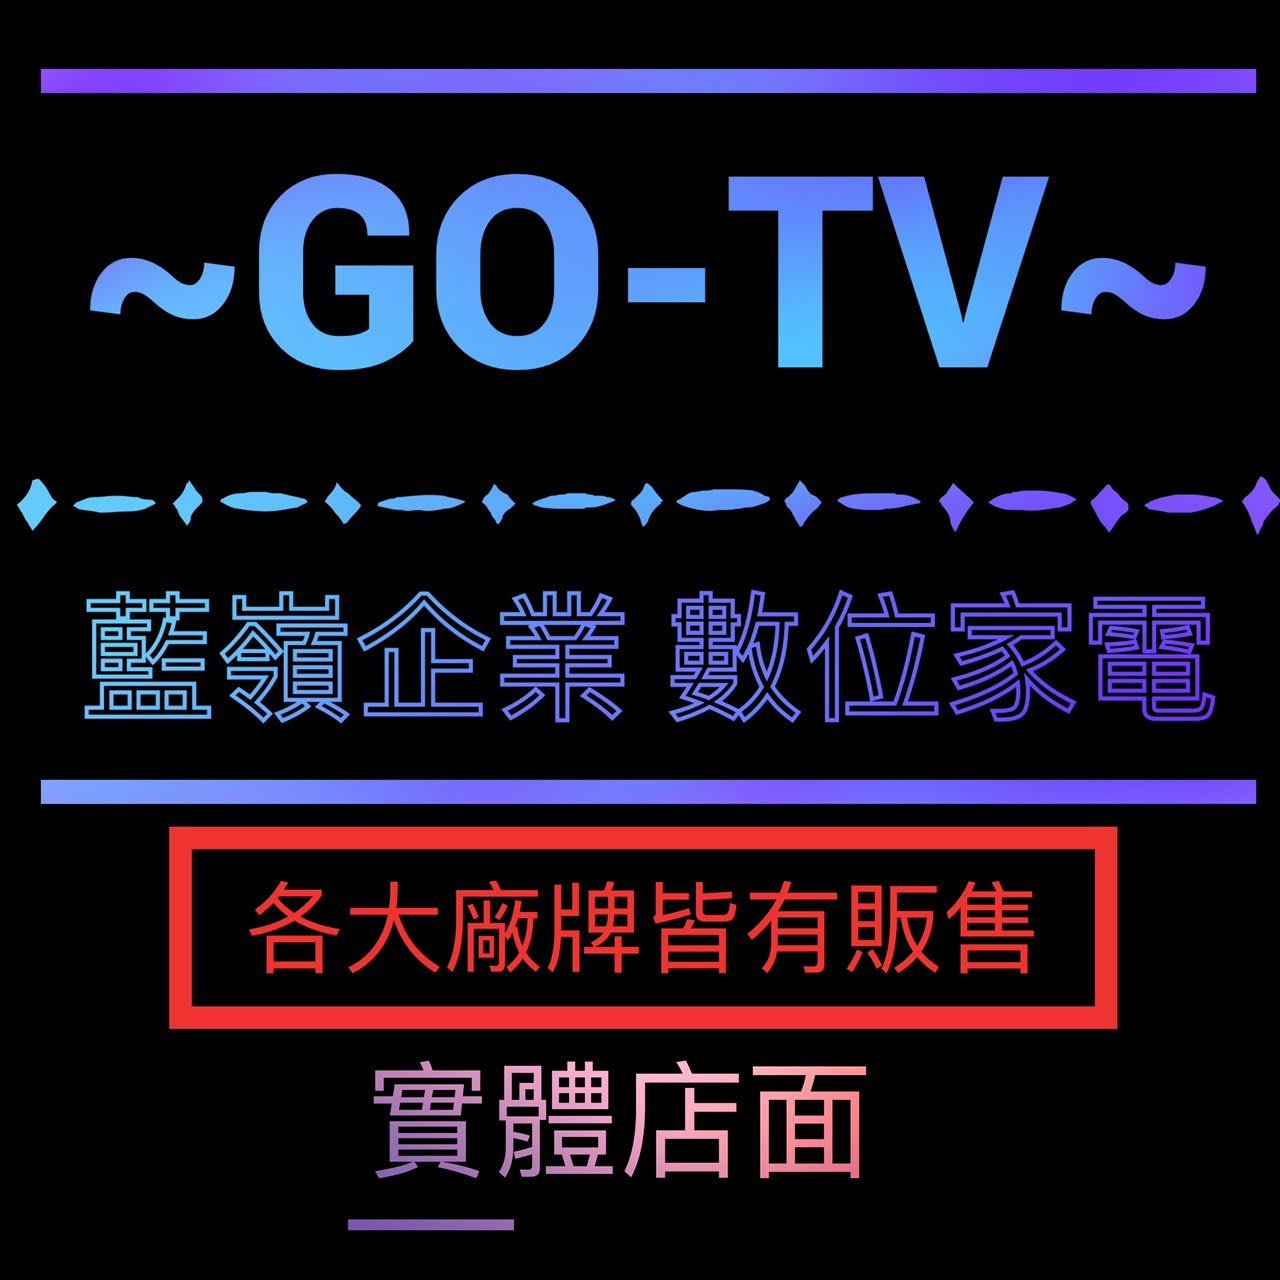 【GO-TV】SAMPO聲寶 17公斤好取式定頻洗衣機 ES-E17B(K2) 台北地區免費運送+基本安裝